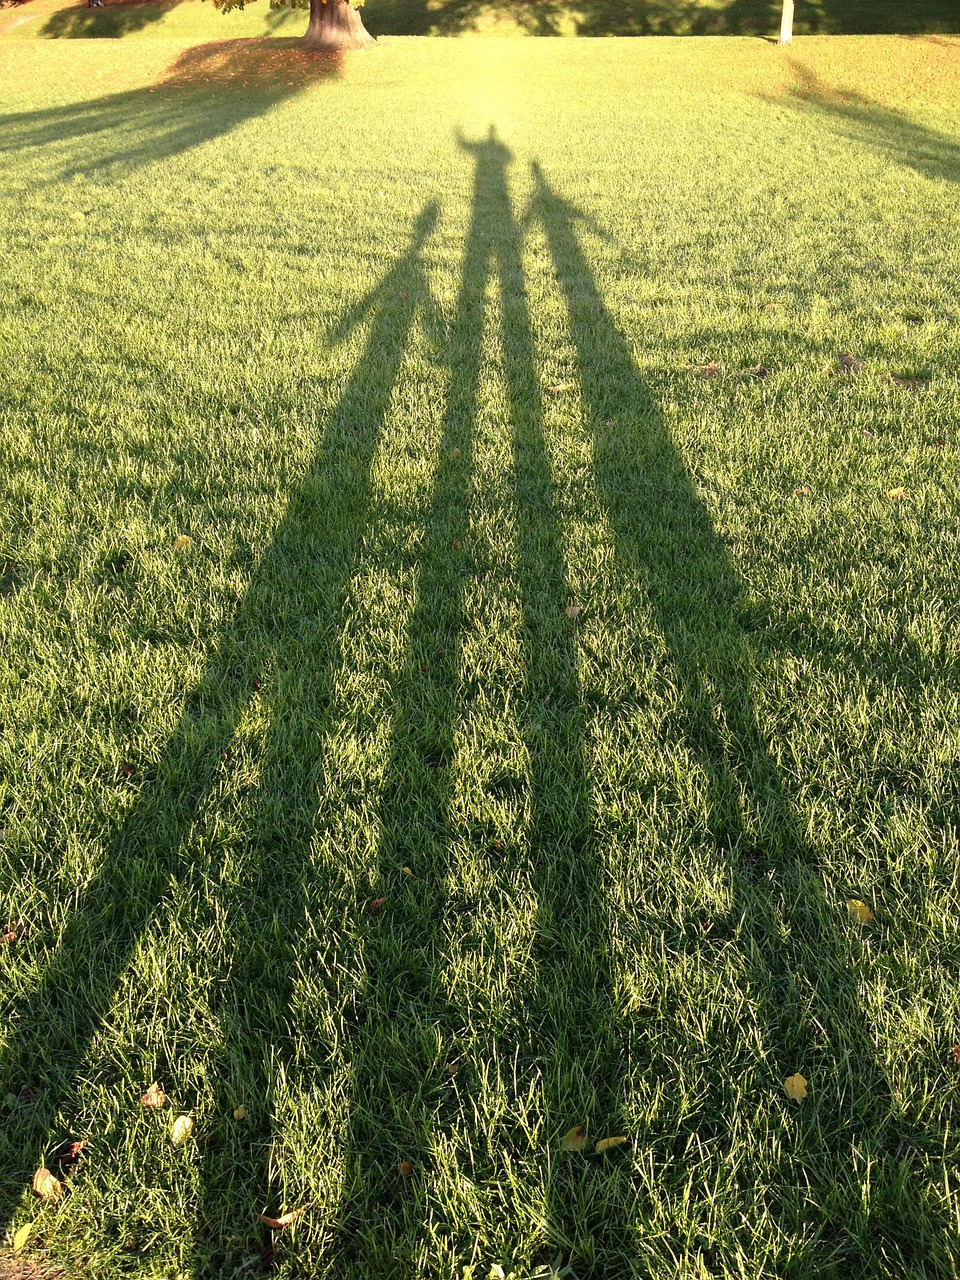 shadows-265295_1280.jpg